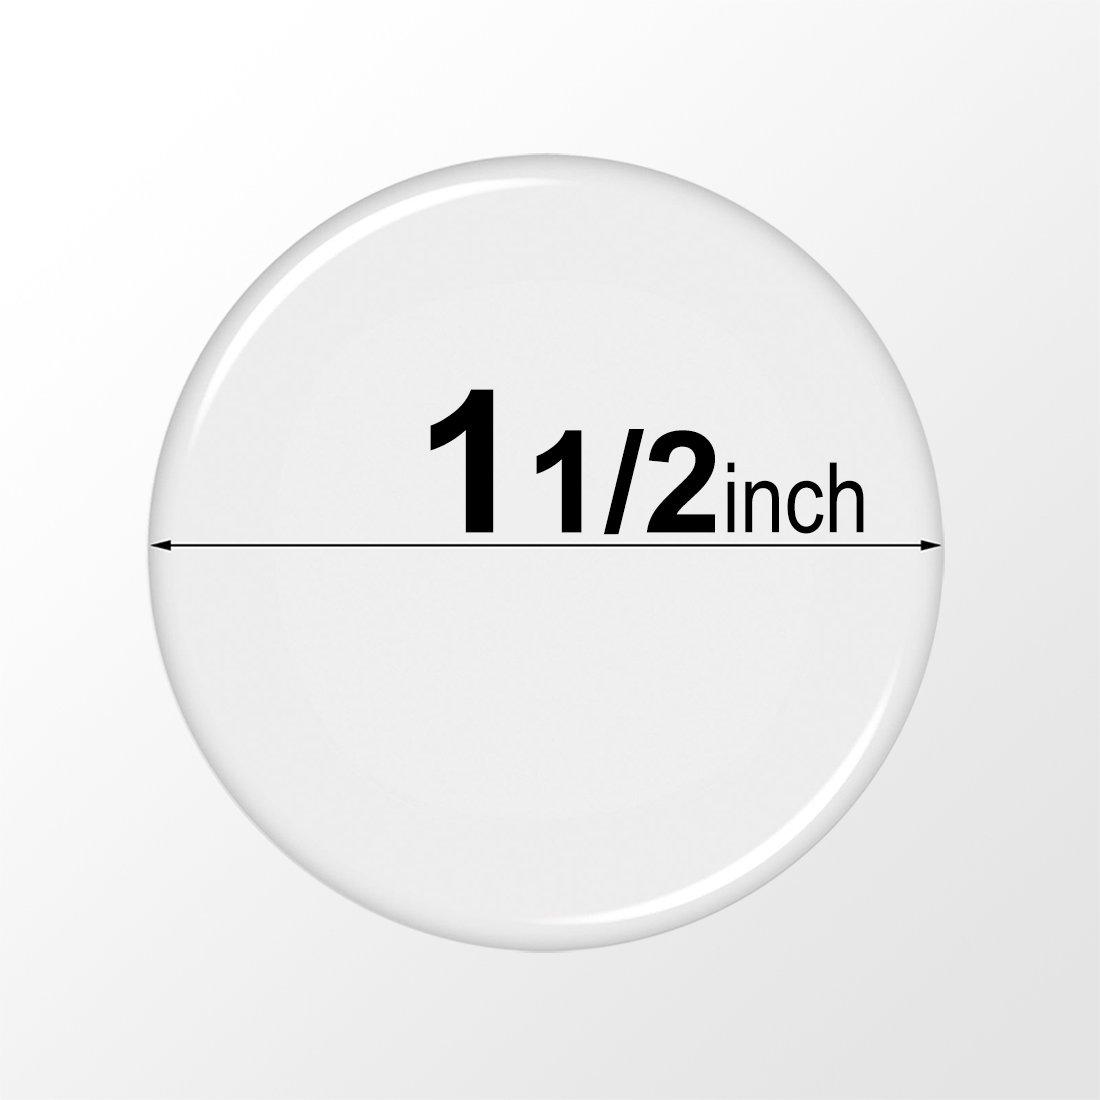 1000 Pcs. Dia: 1.5 inch - (38.1mm Clear Round Epoxy Stickers